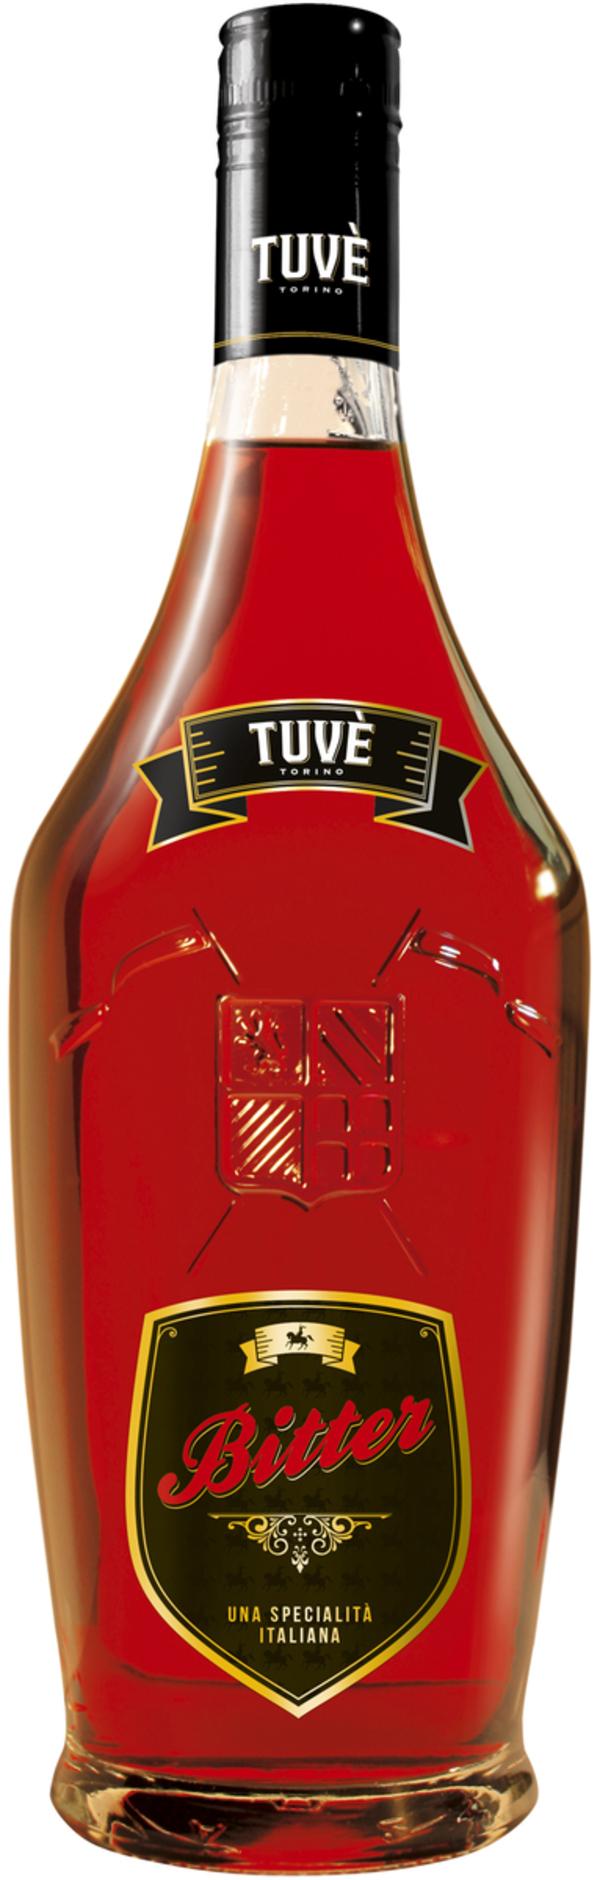 Drapò Tuvé Bitter    - Aperitif - Turin Vermouth, Italien, trocken, 0,7l